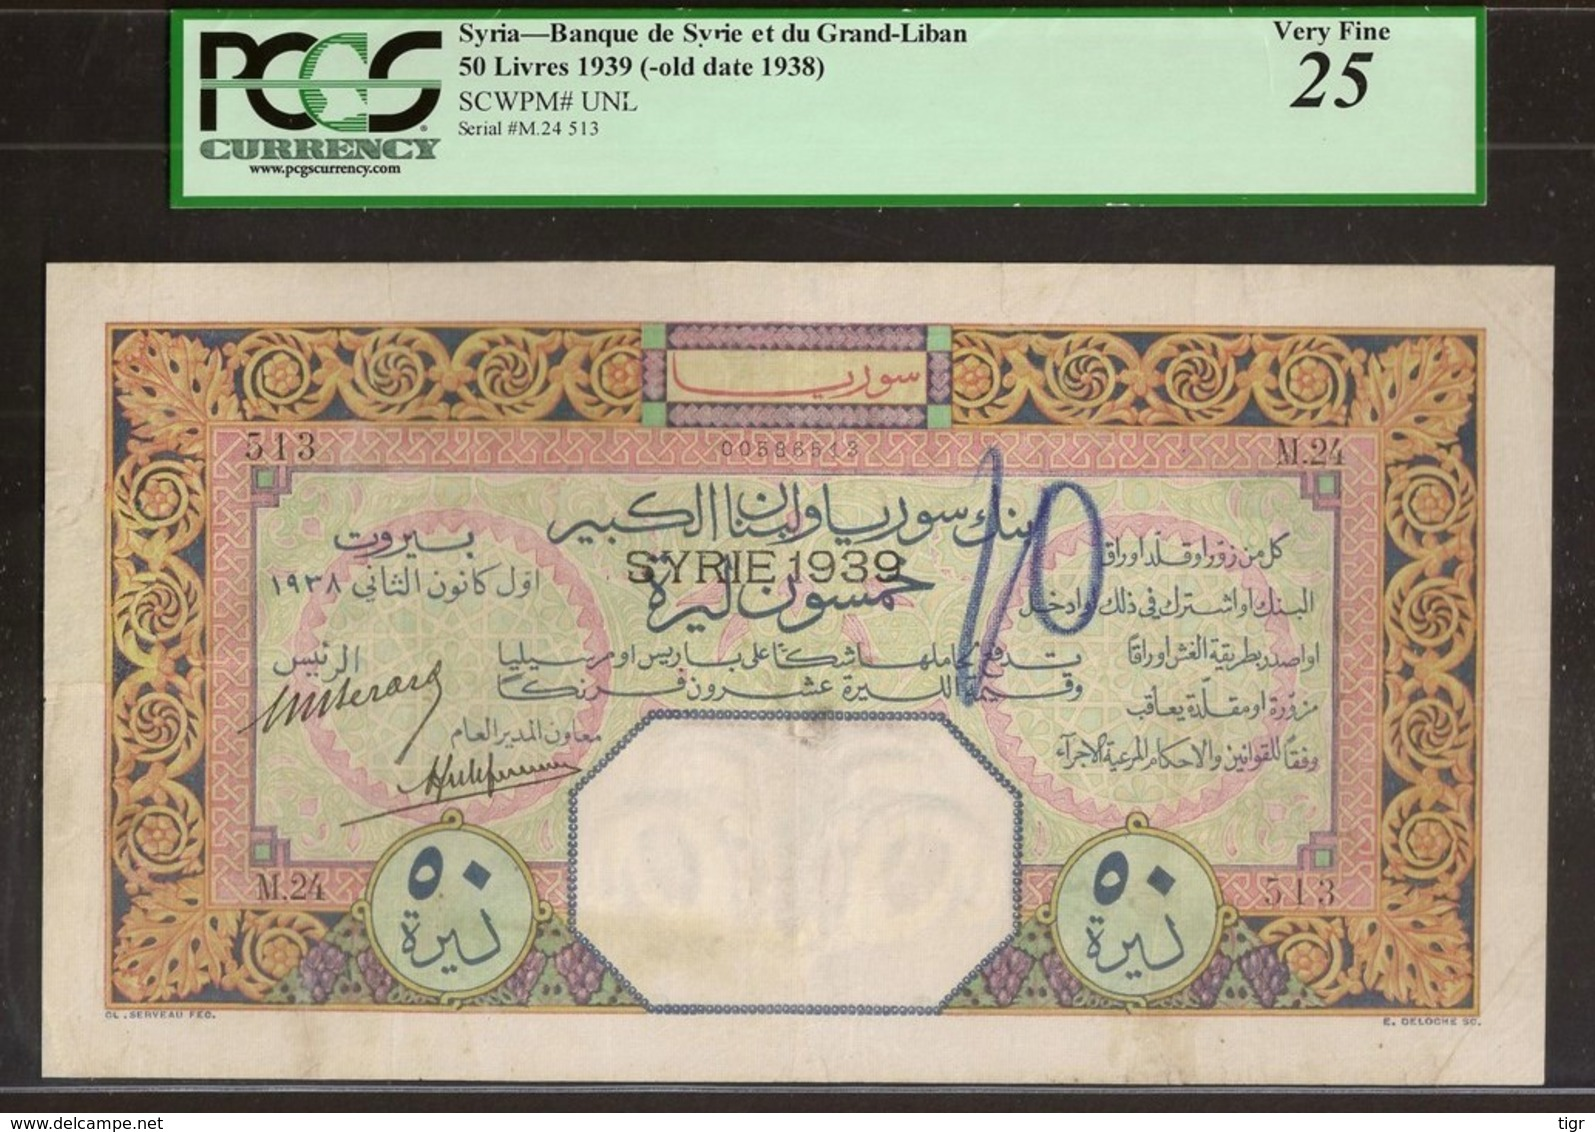 SYRIA. 50 Livres 1939. Banque De Syrie Et Du Grand - Liban. Pick Unlisted. - Syria